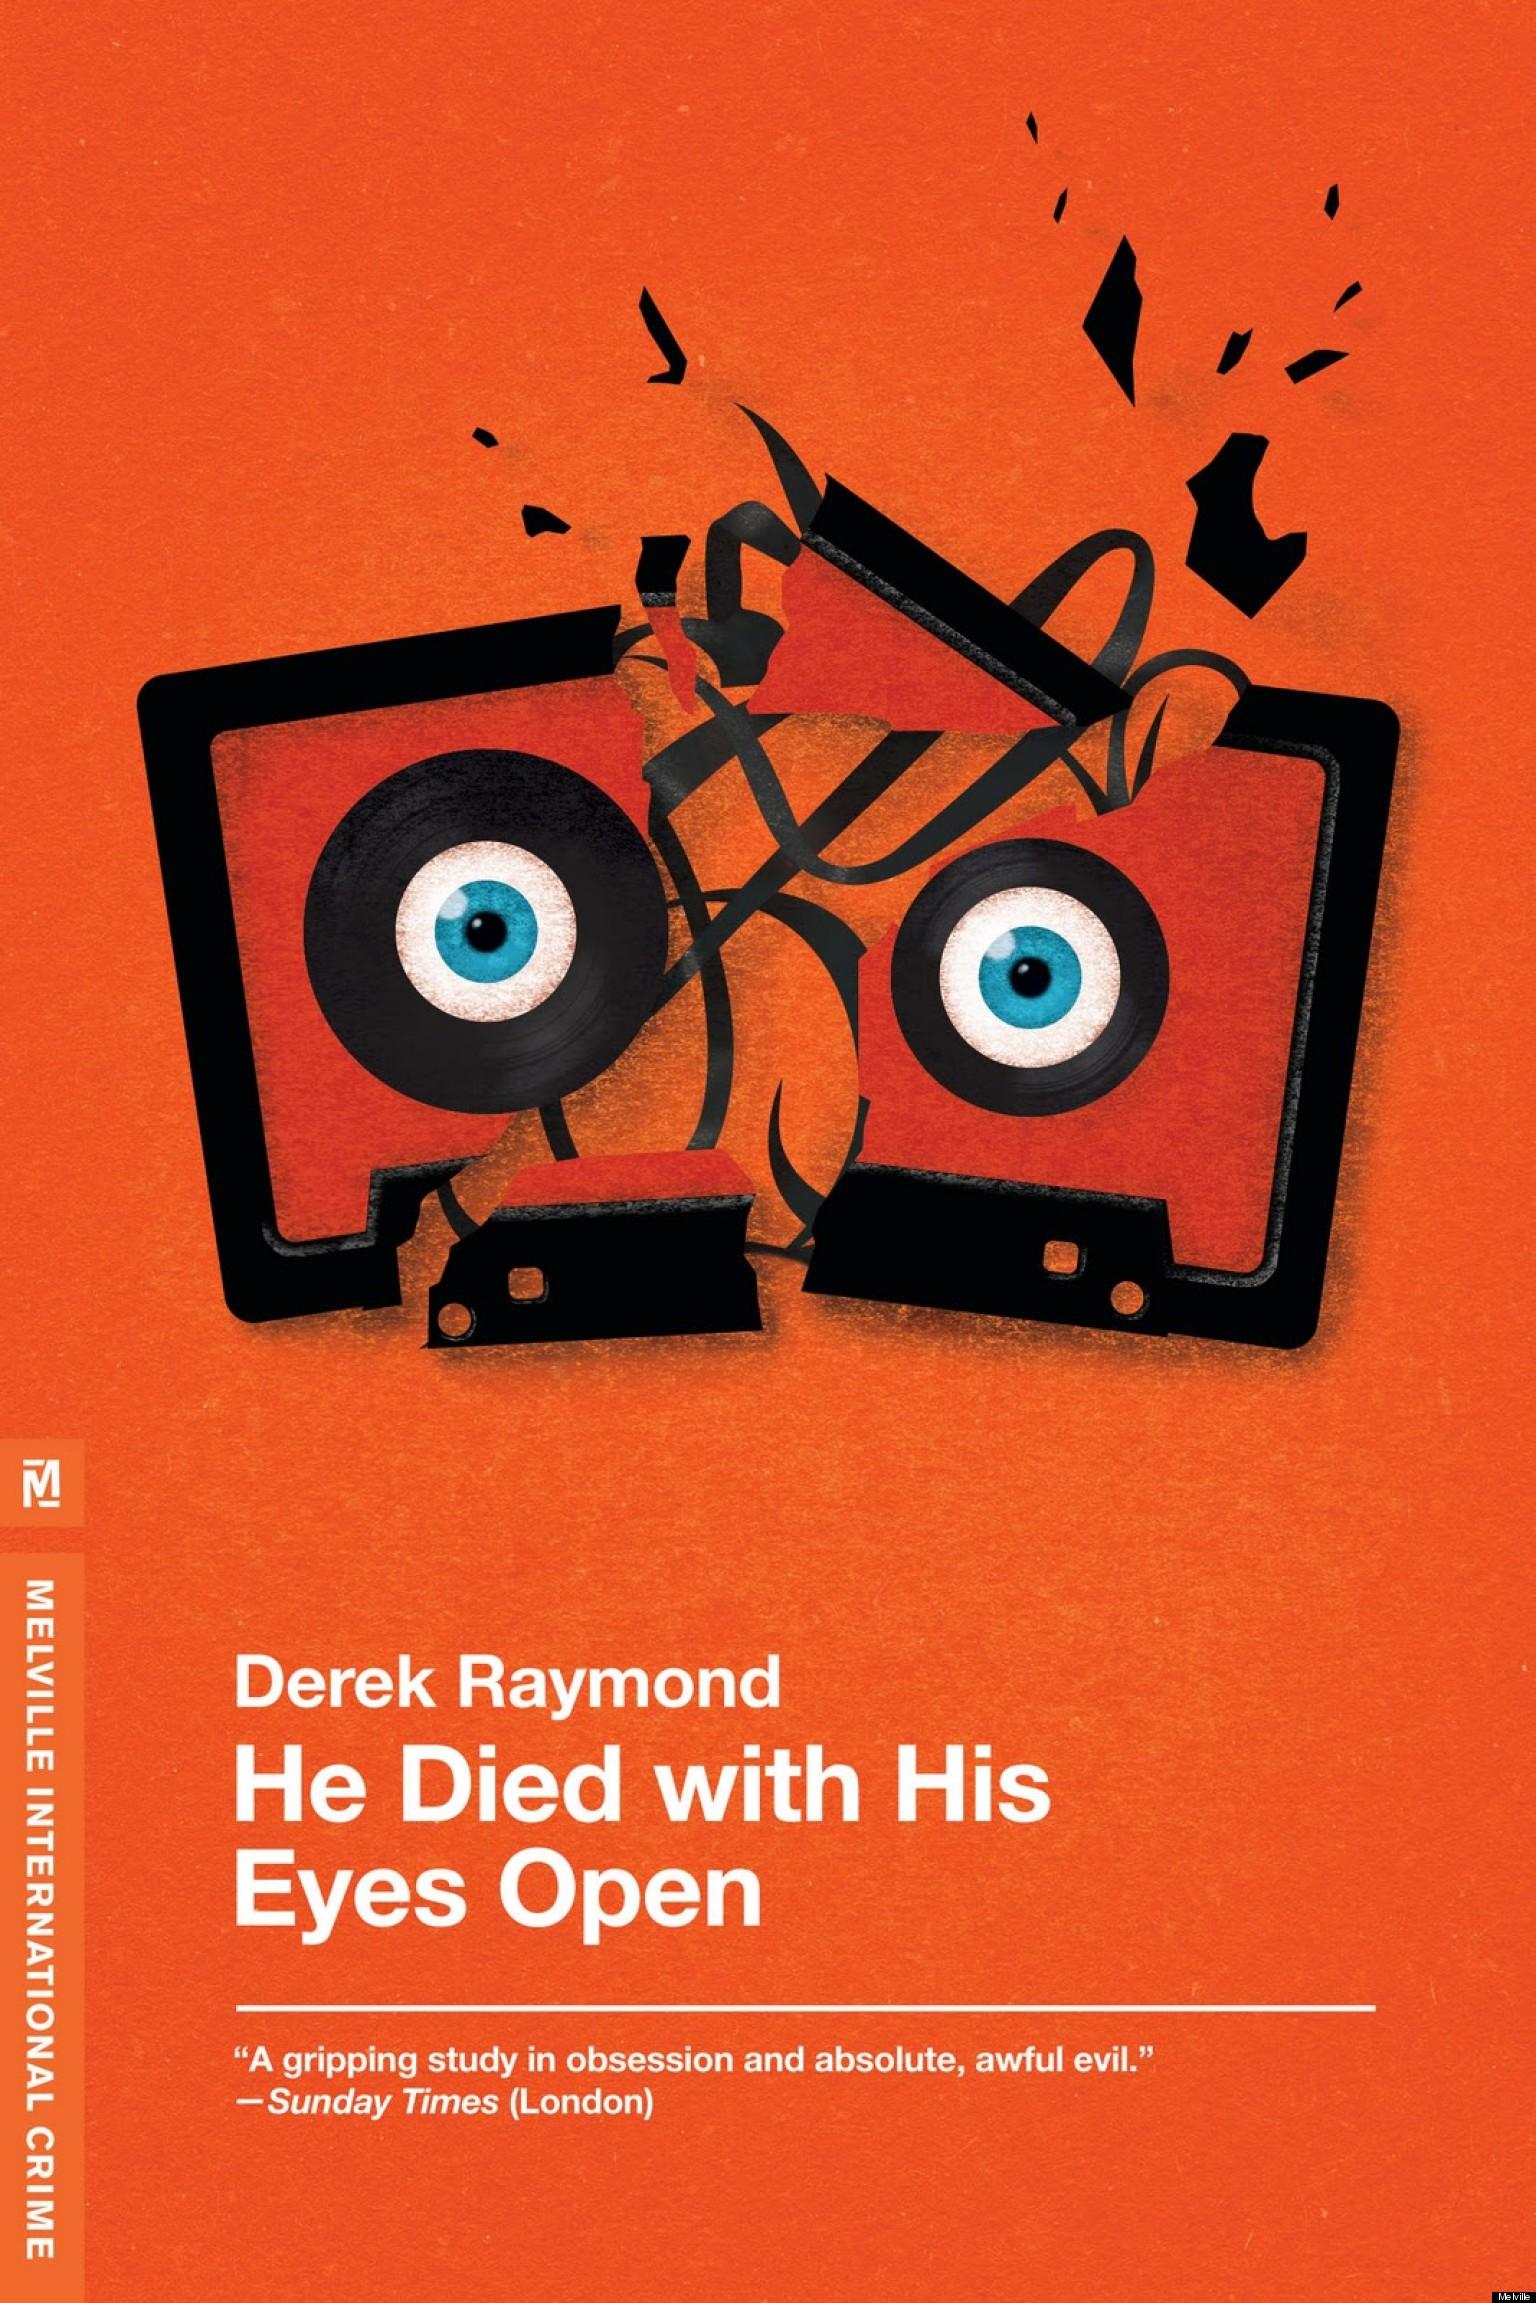 Best Book Designs 2011 Design Observer Names Winners